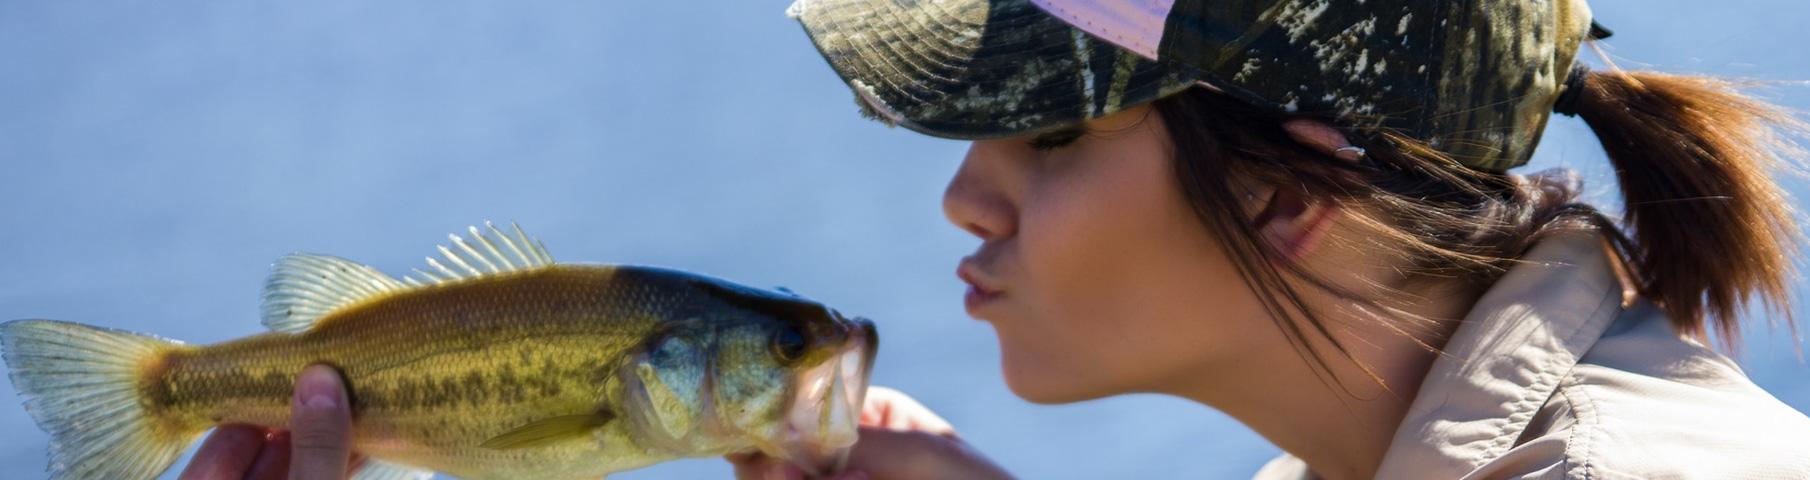 girl kissing fish